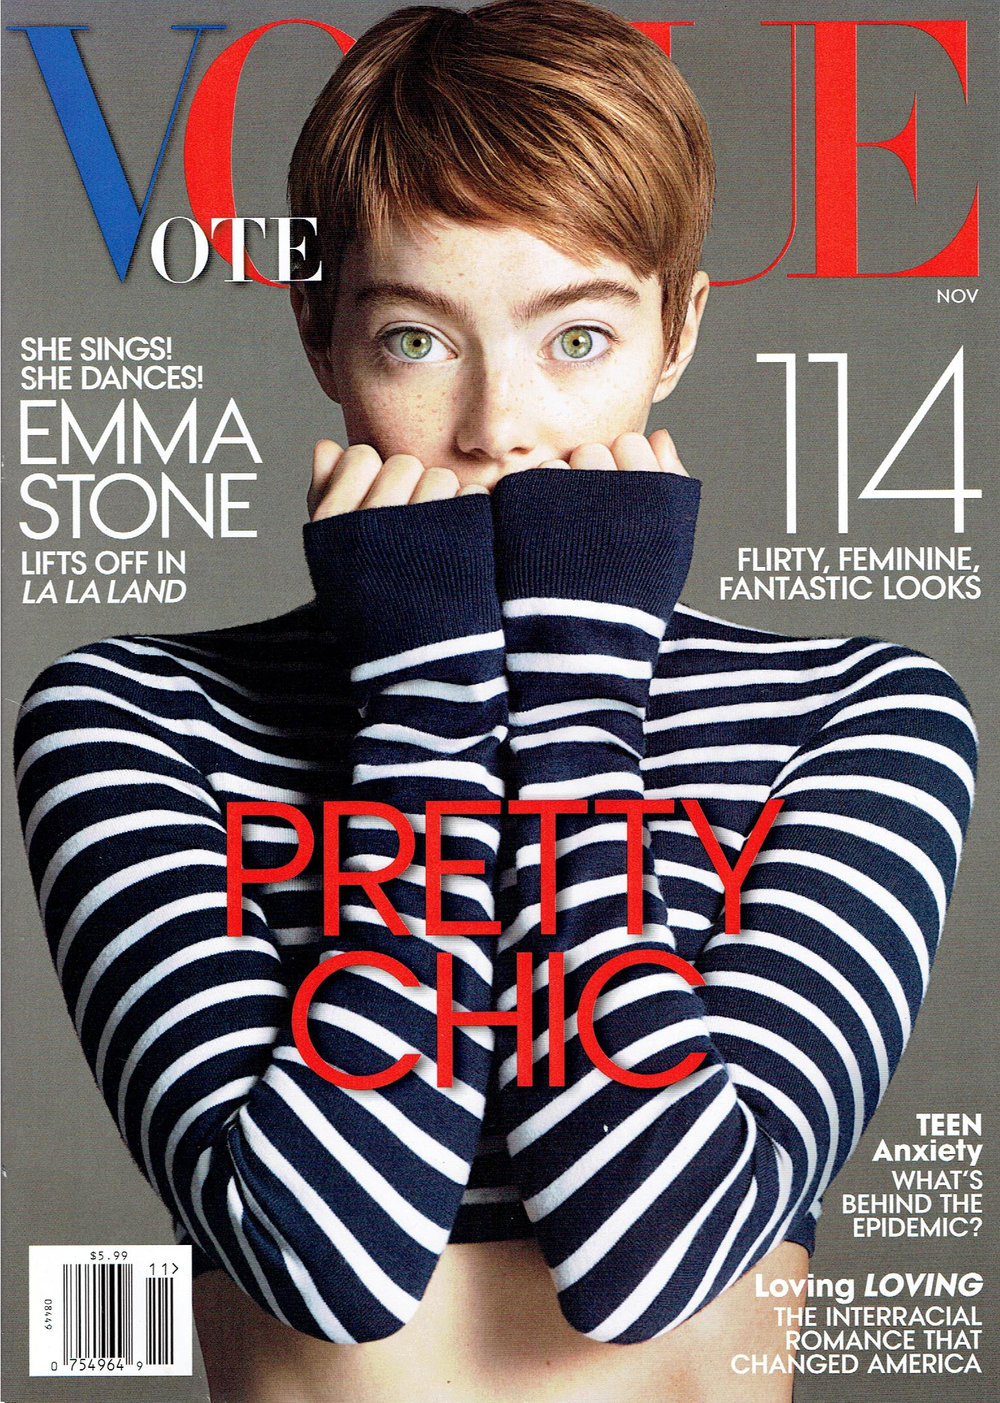 Vogue November 2016 001.jpg